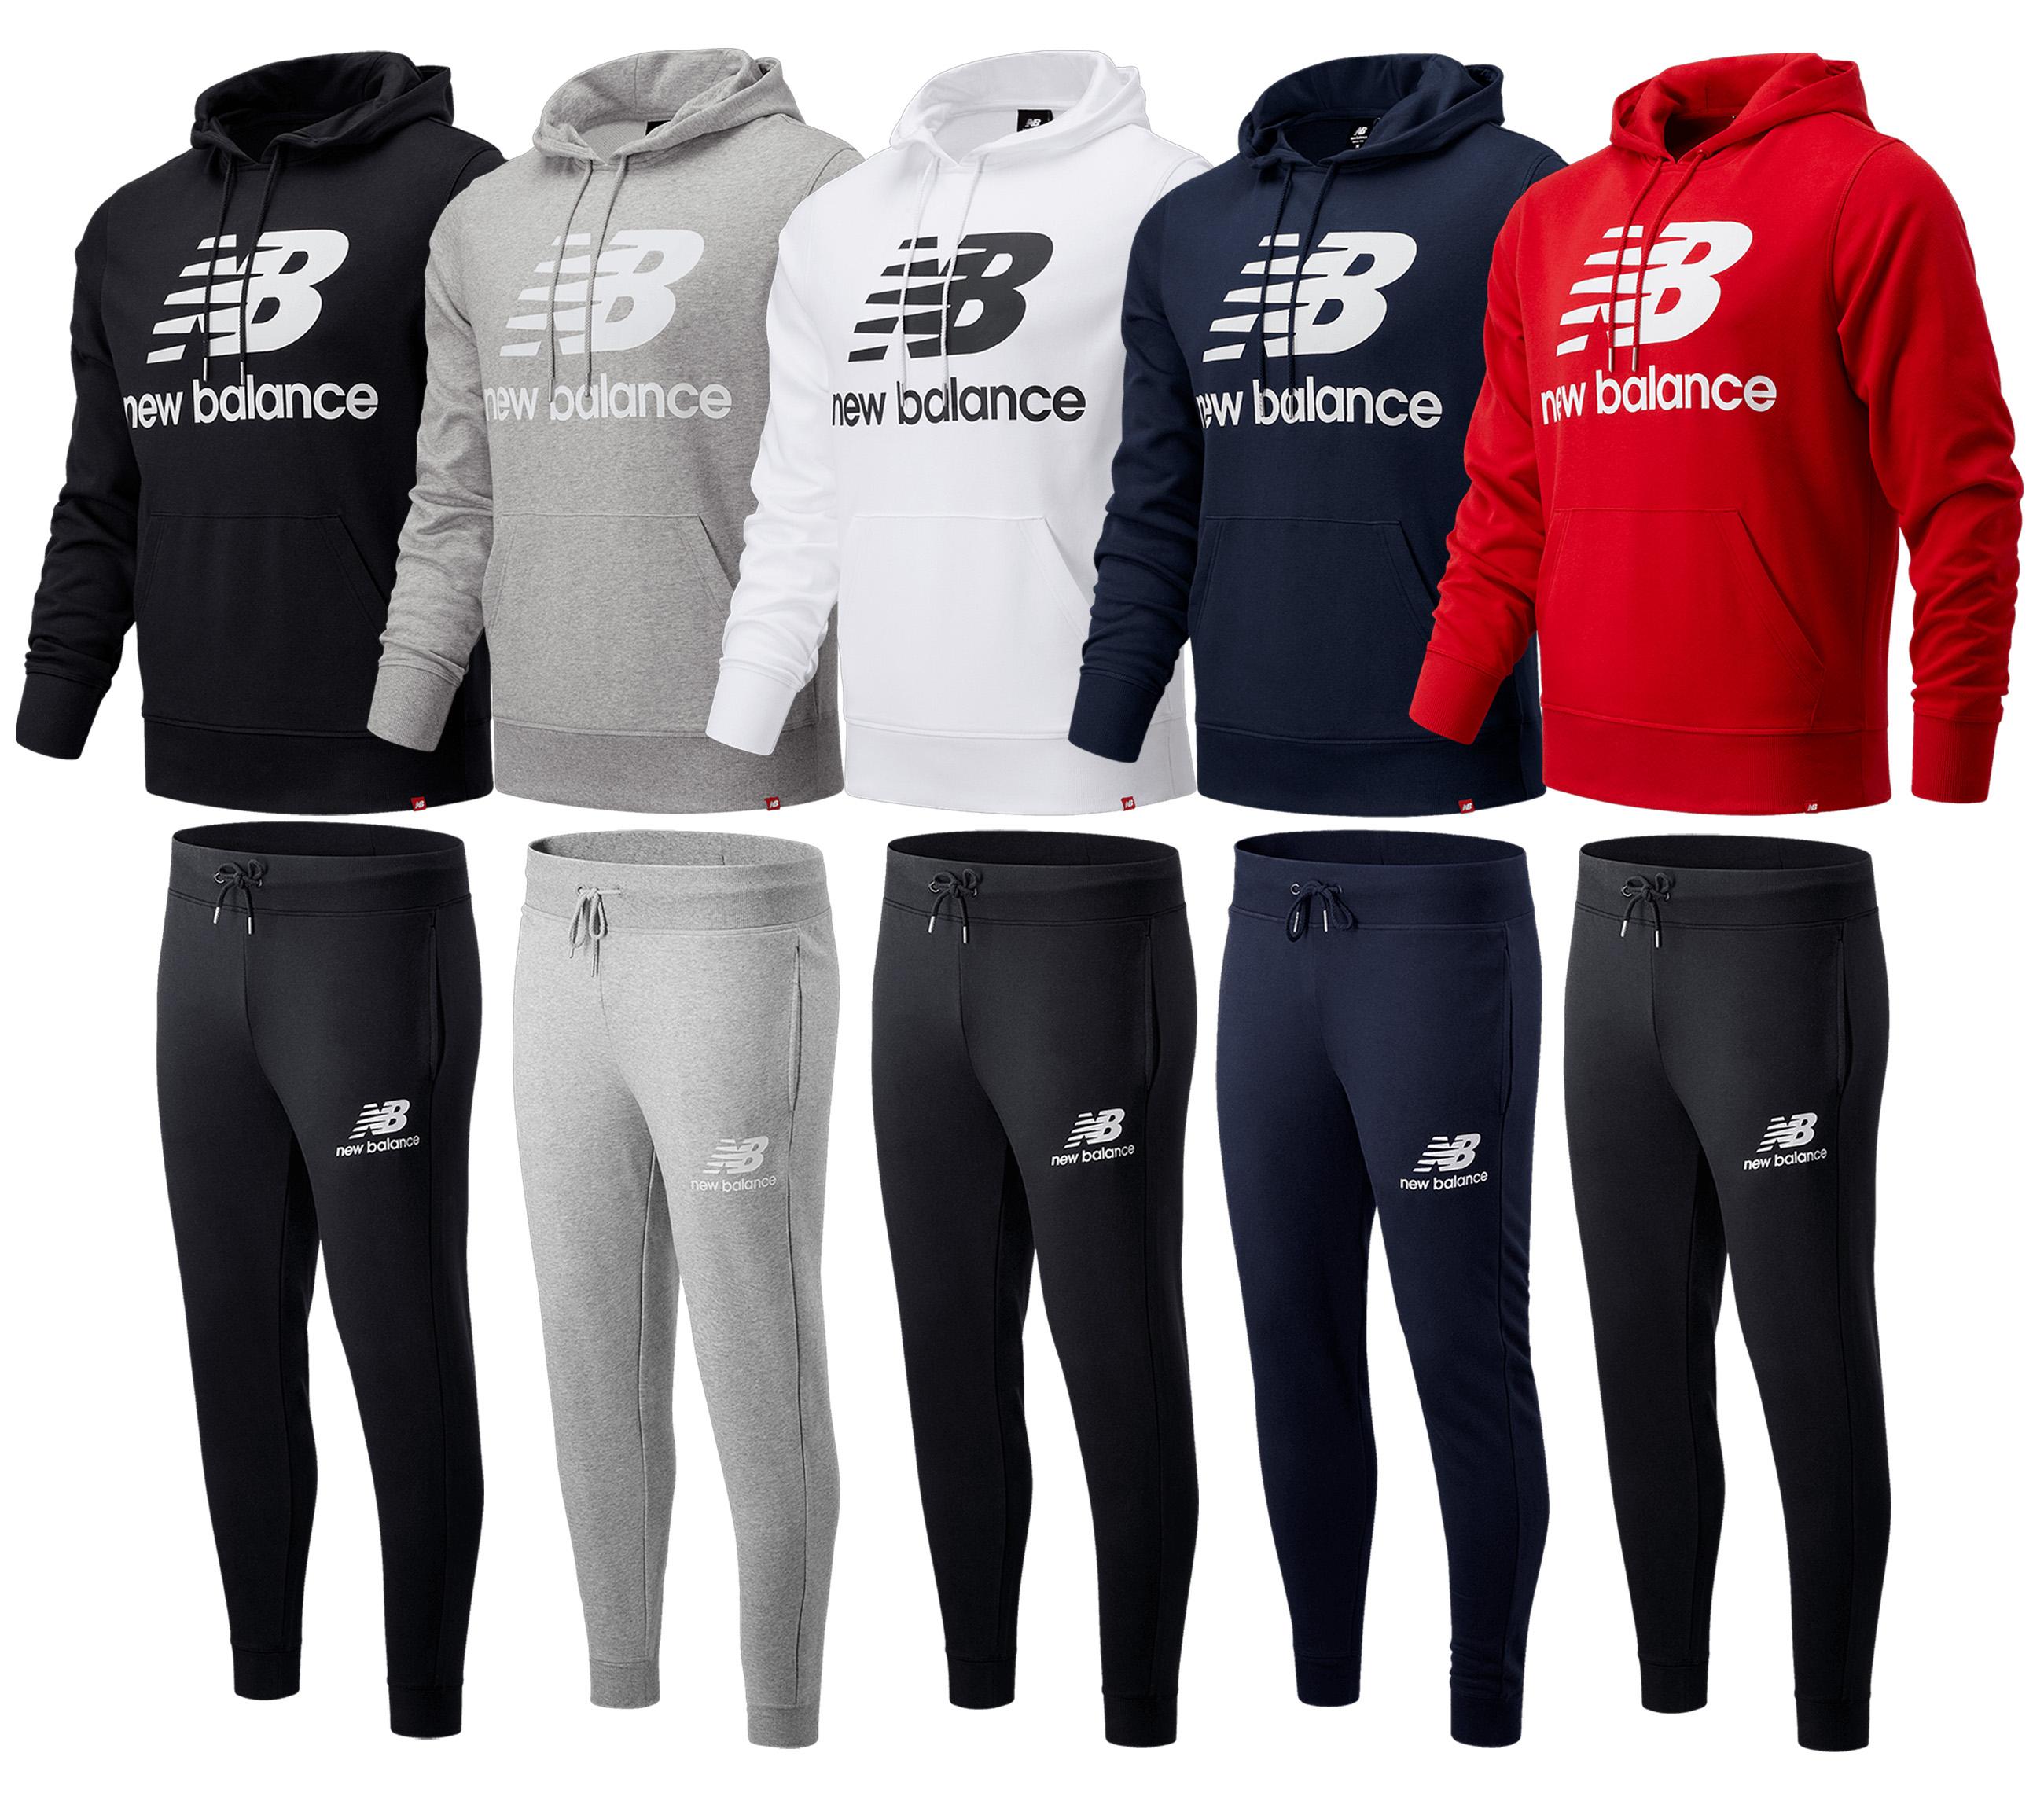 New Balance Jogginganzug Essentials // 5 Farben / Größe S-XXL